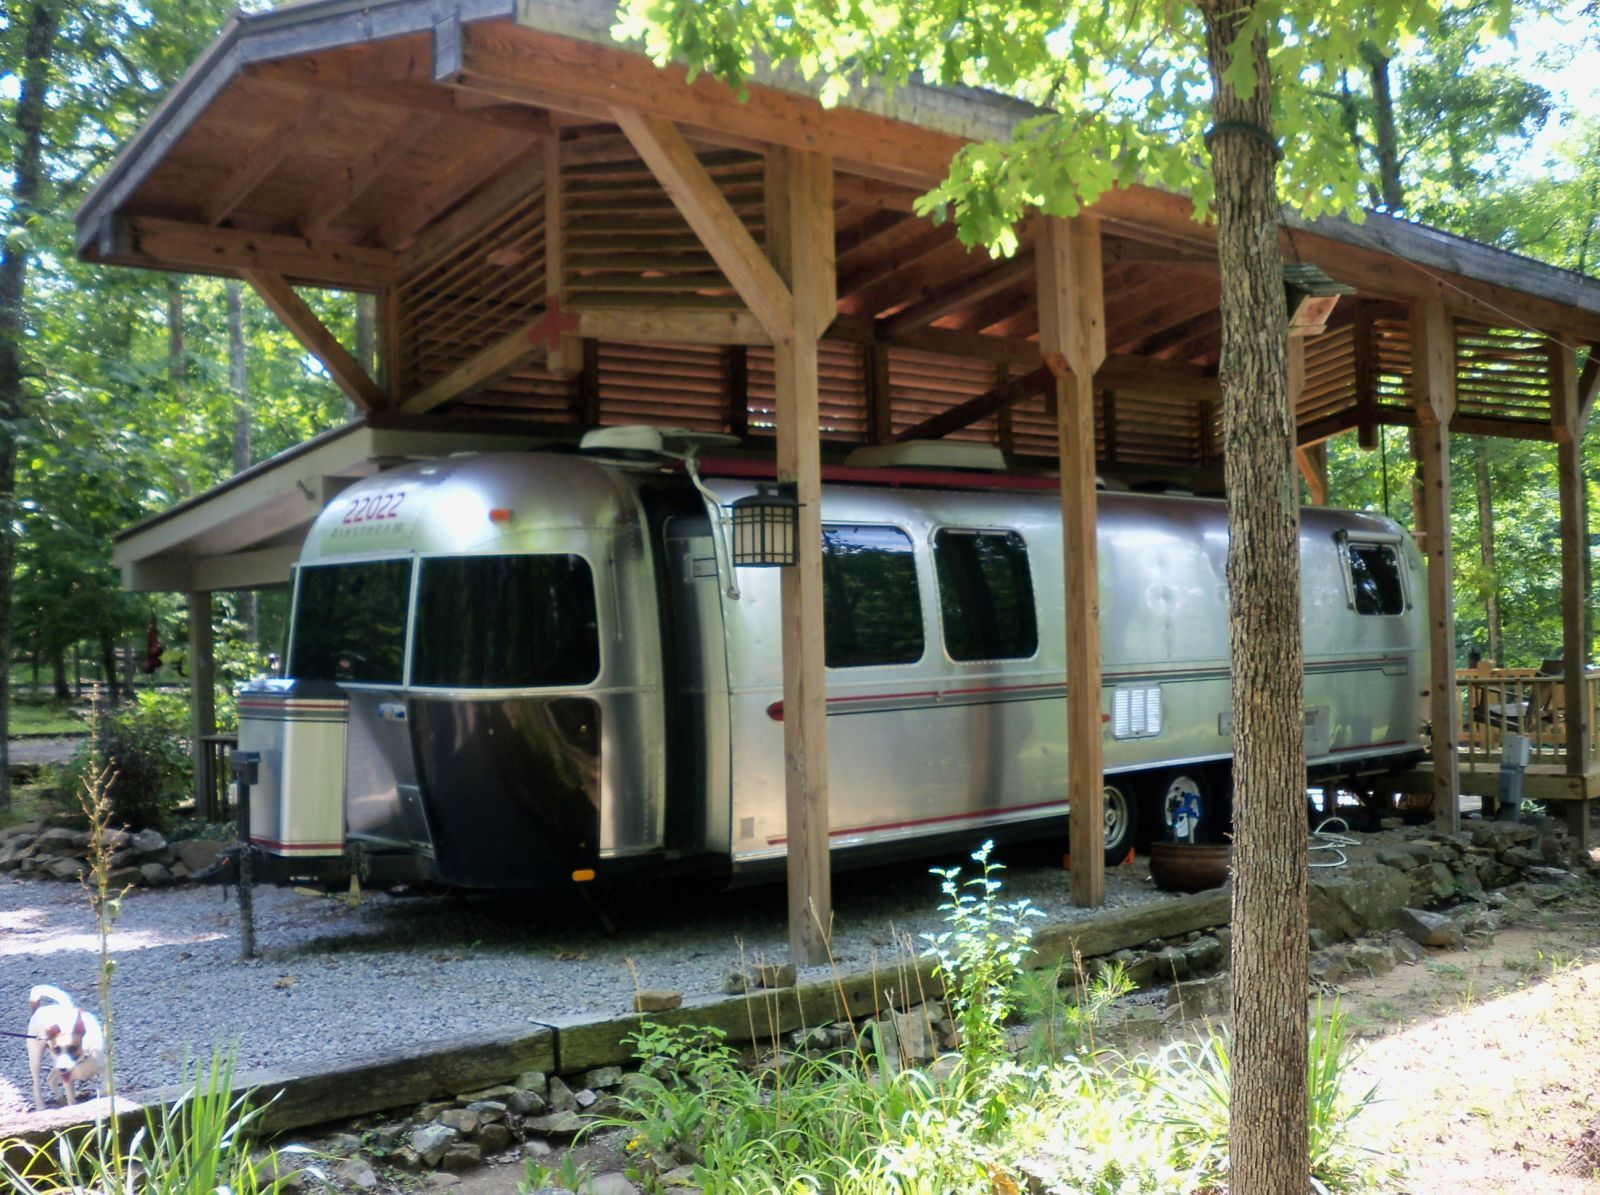 Homebase for the Airstream Rv homes, Rv shelter